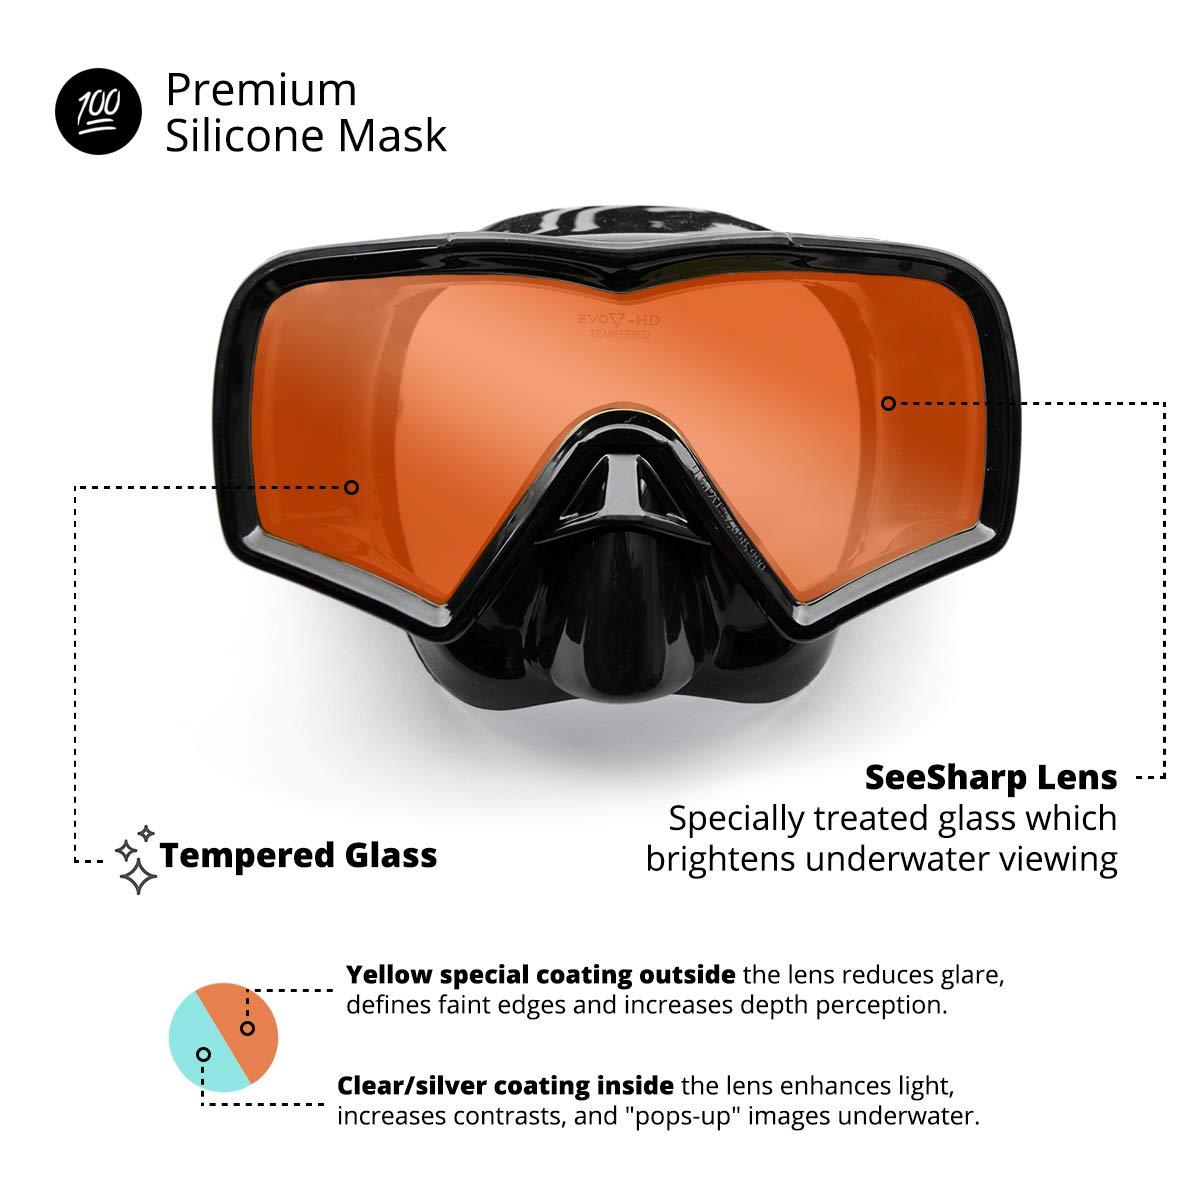 EVO Hi Definition Snorkel Combo - Single Lens Mask Infographic